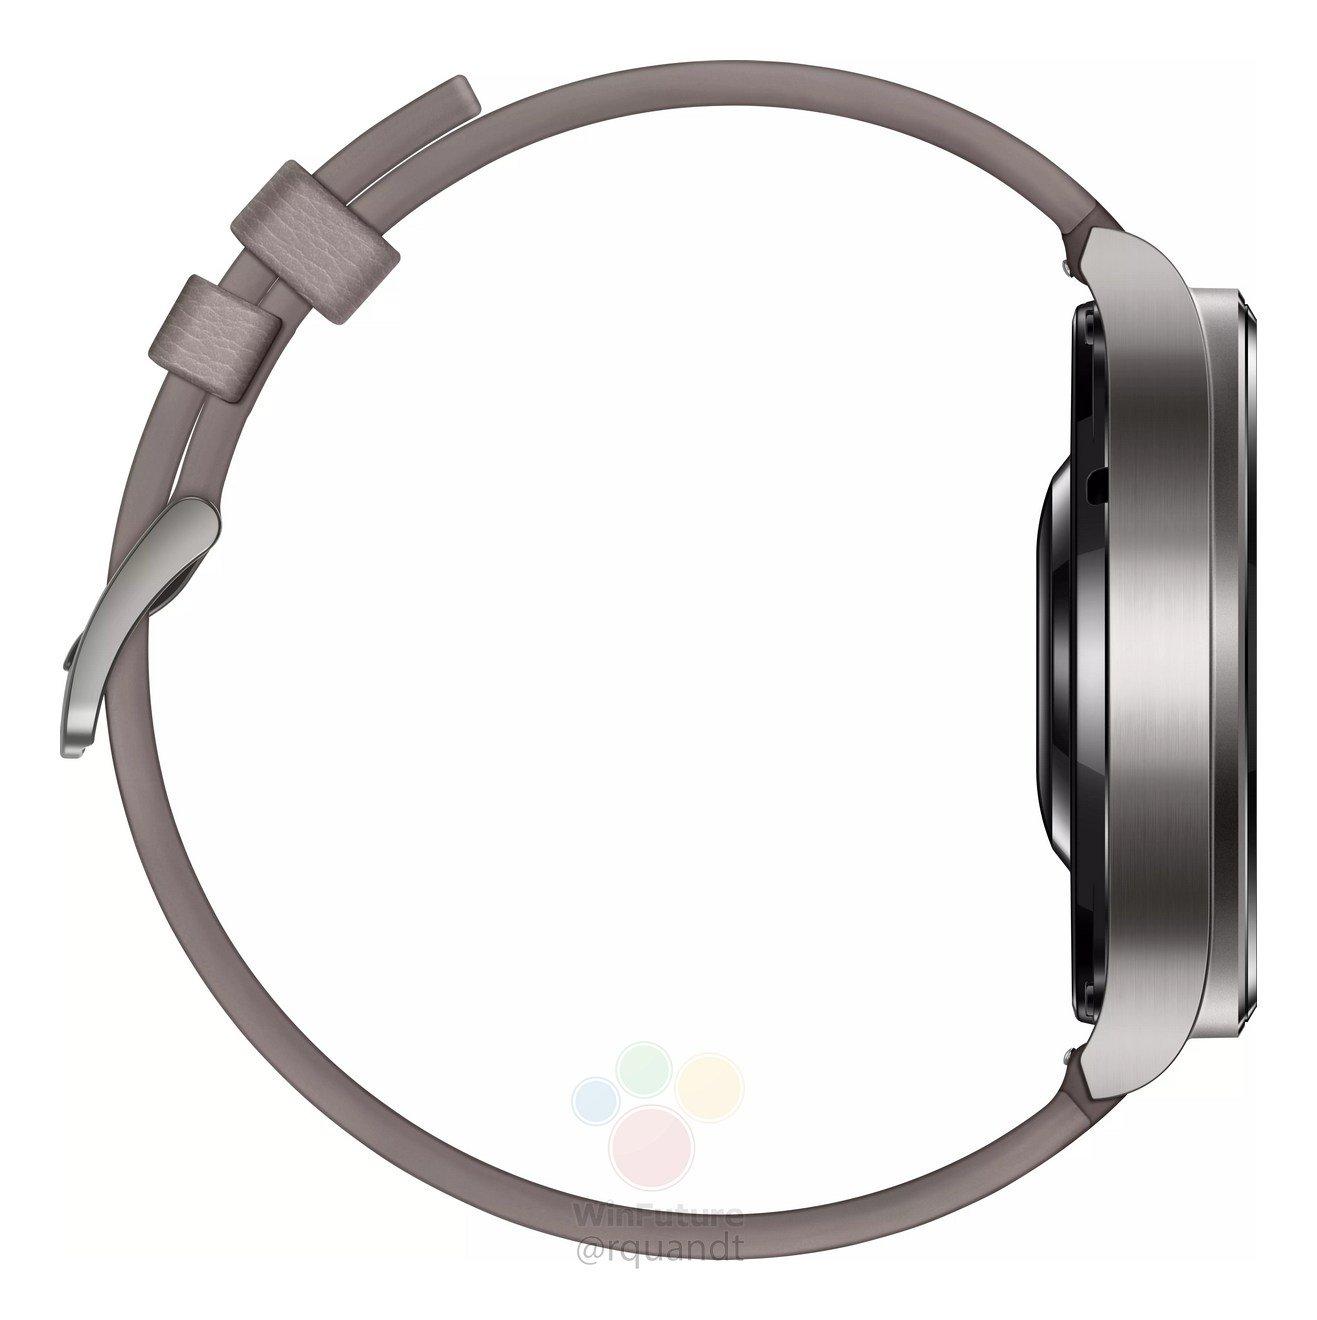 Huawei Watch GT2 Pro 1599138650 0 0 large